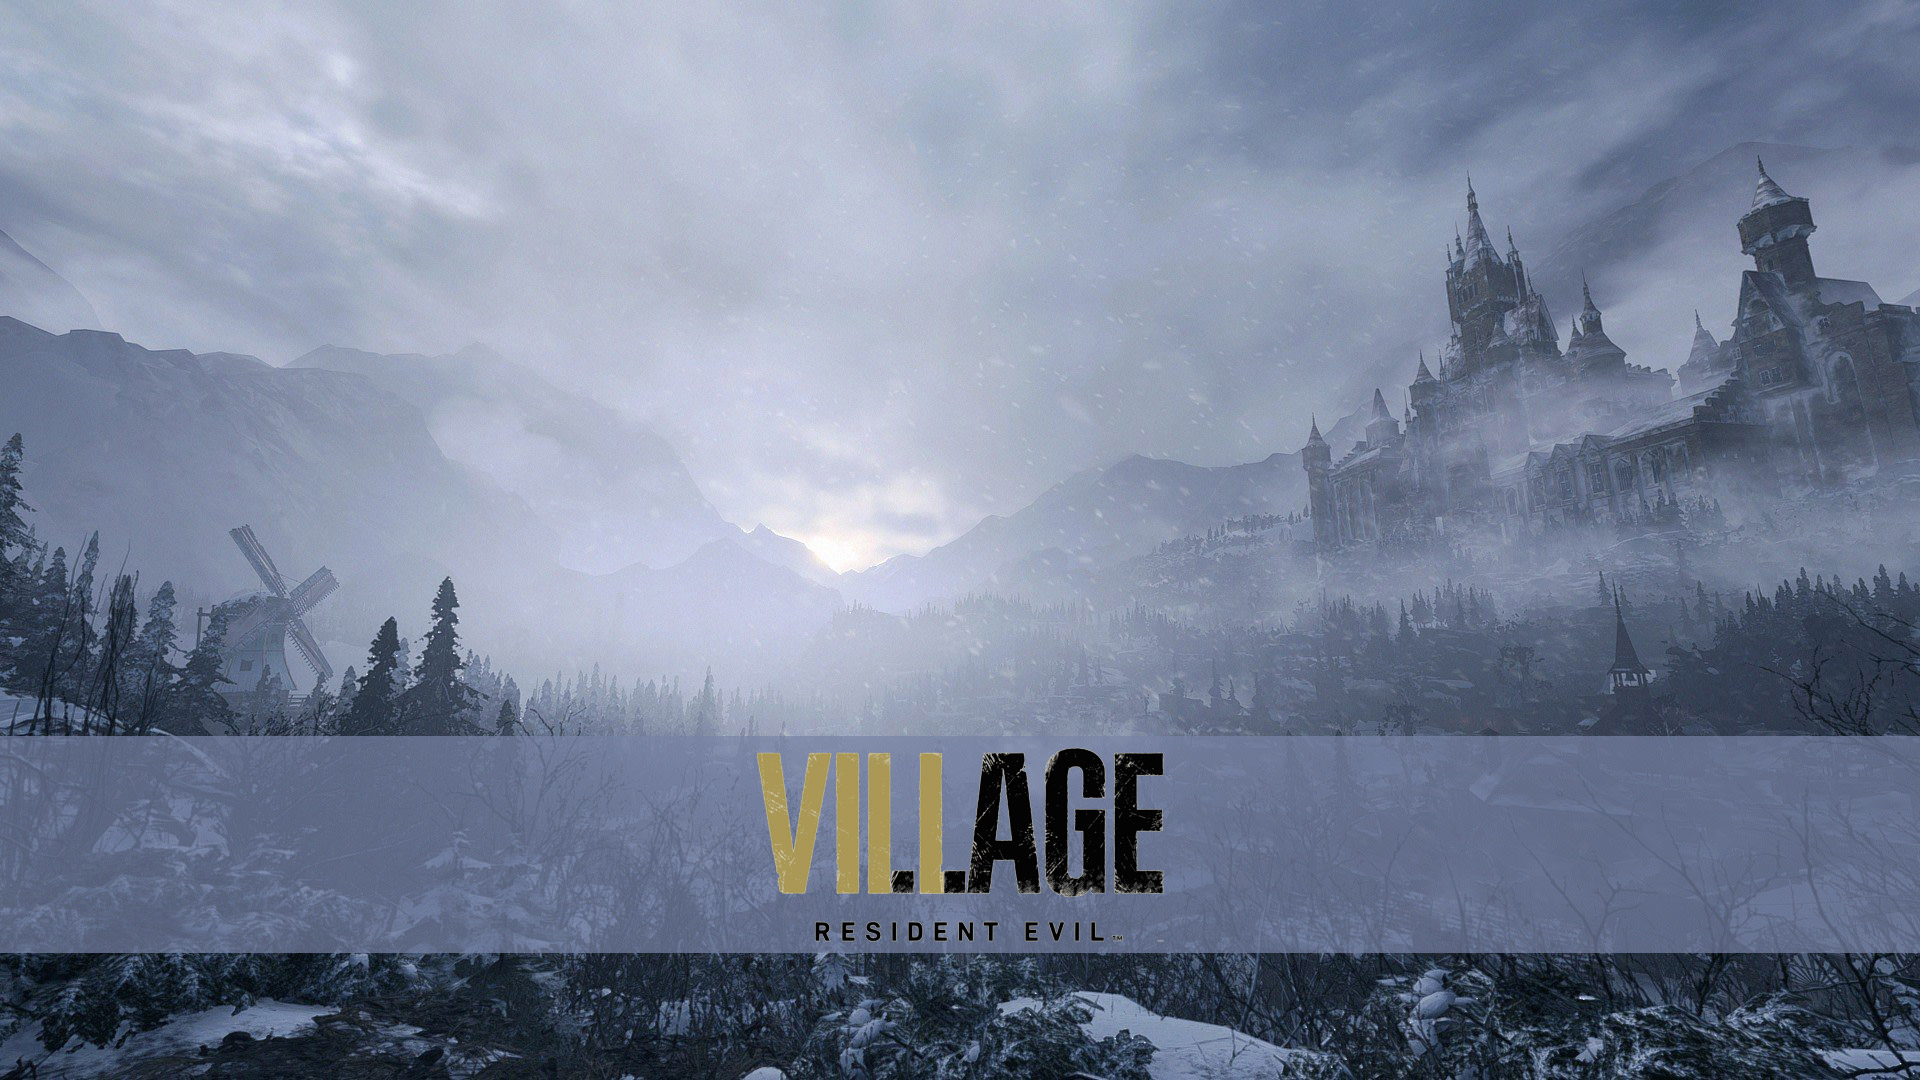 Free Resident Evil Village Wallpaper in 1920x1080